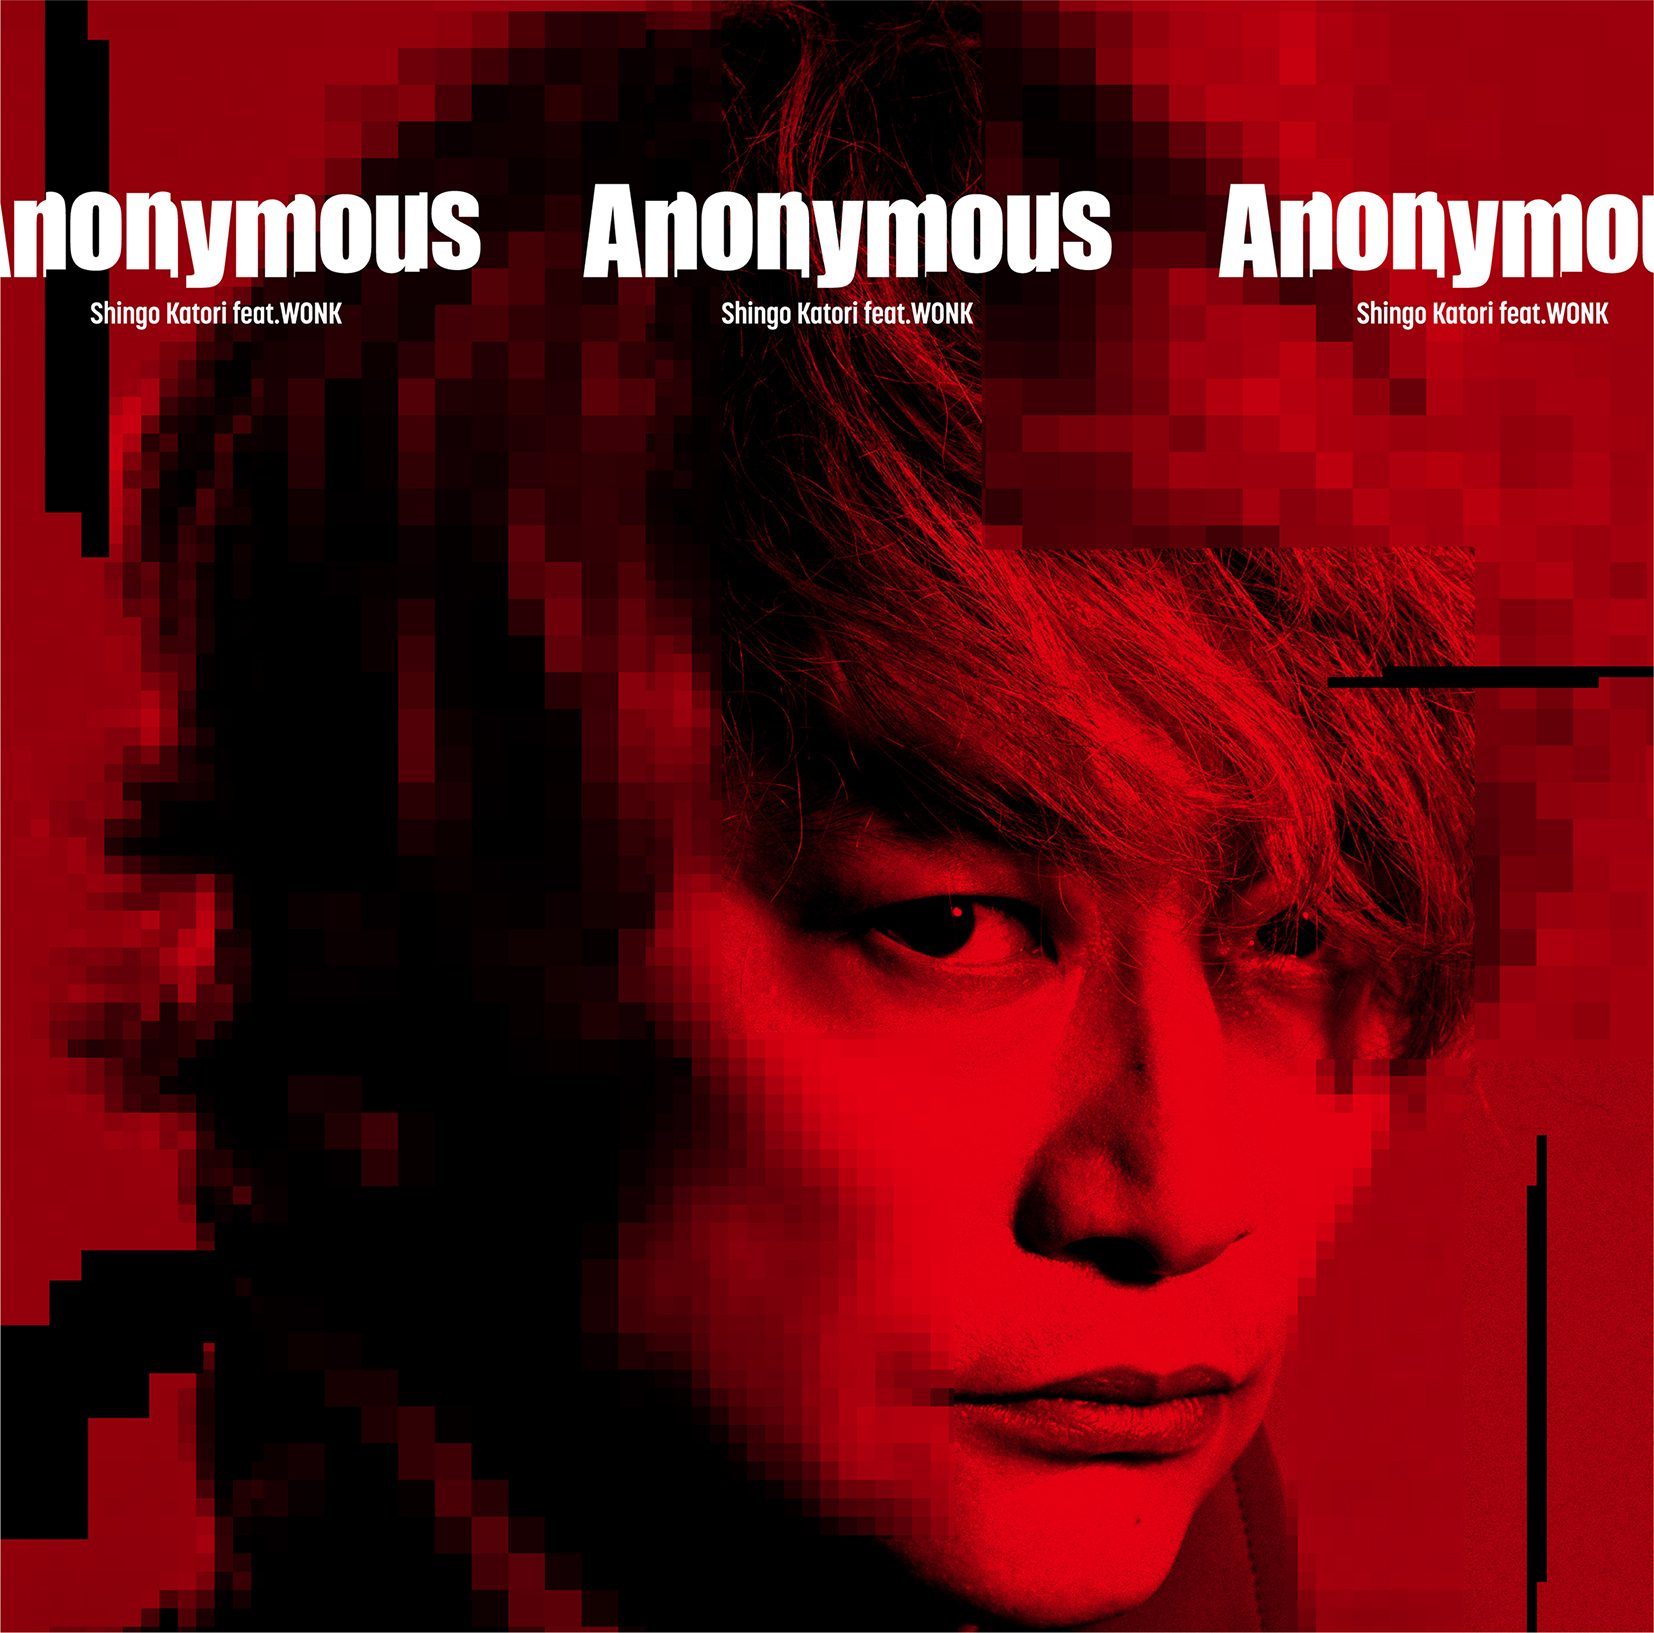 「Anonymous(feat.WONK)」ジャケット